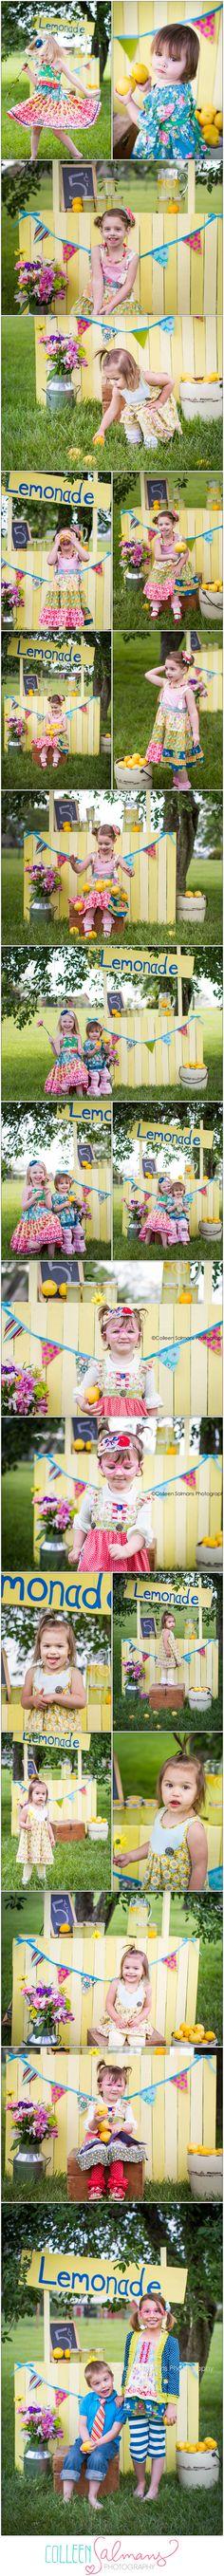 Styled Lemonade Stand Photography ~ colleensalmansphotography.com » Kansas City Portrait & Child Photographer